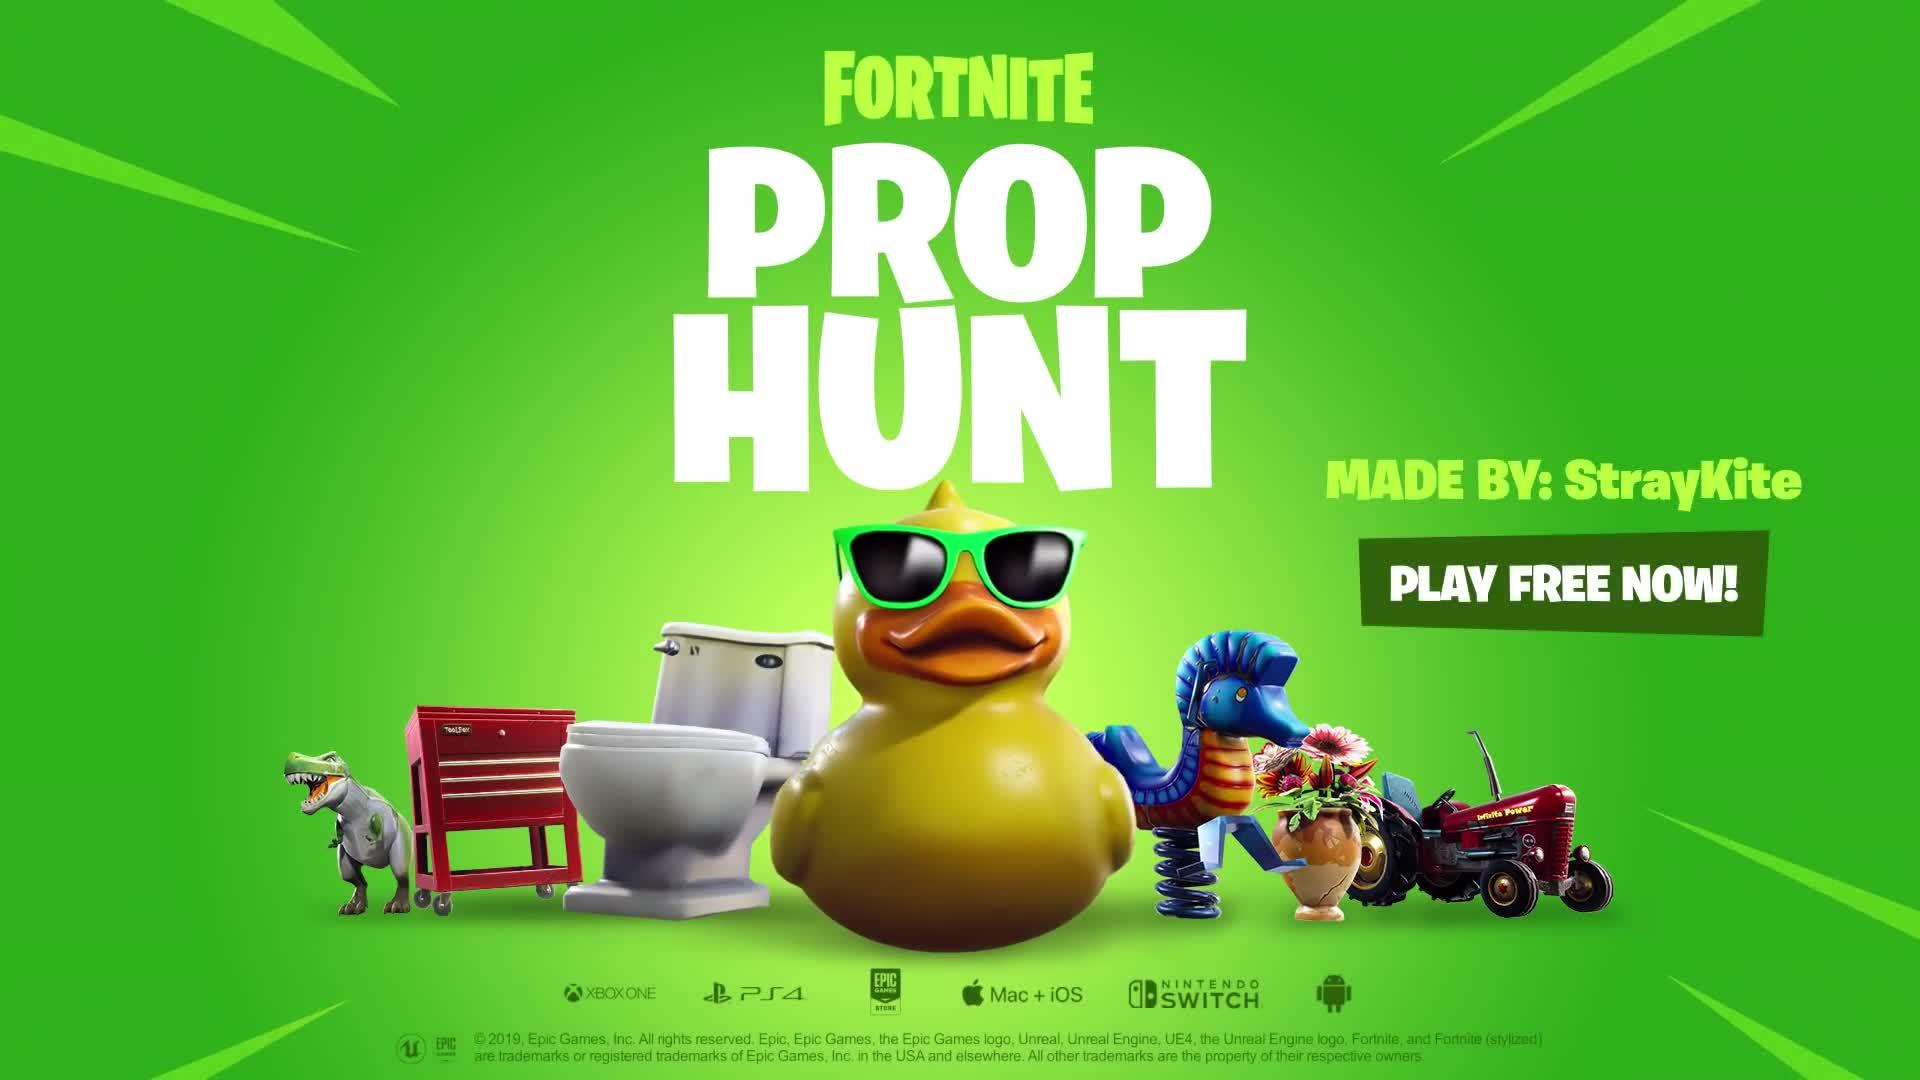 Fortnite Prop Hunt